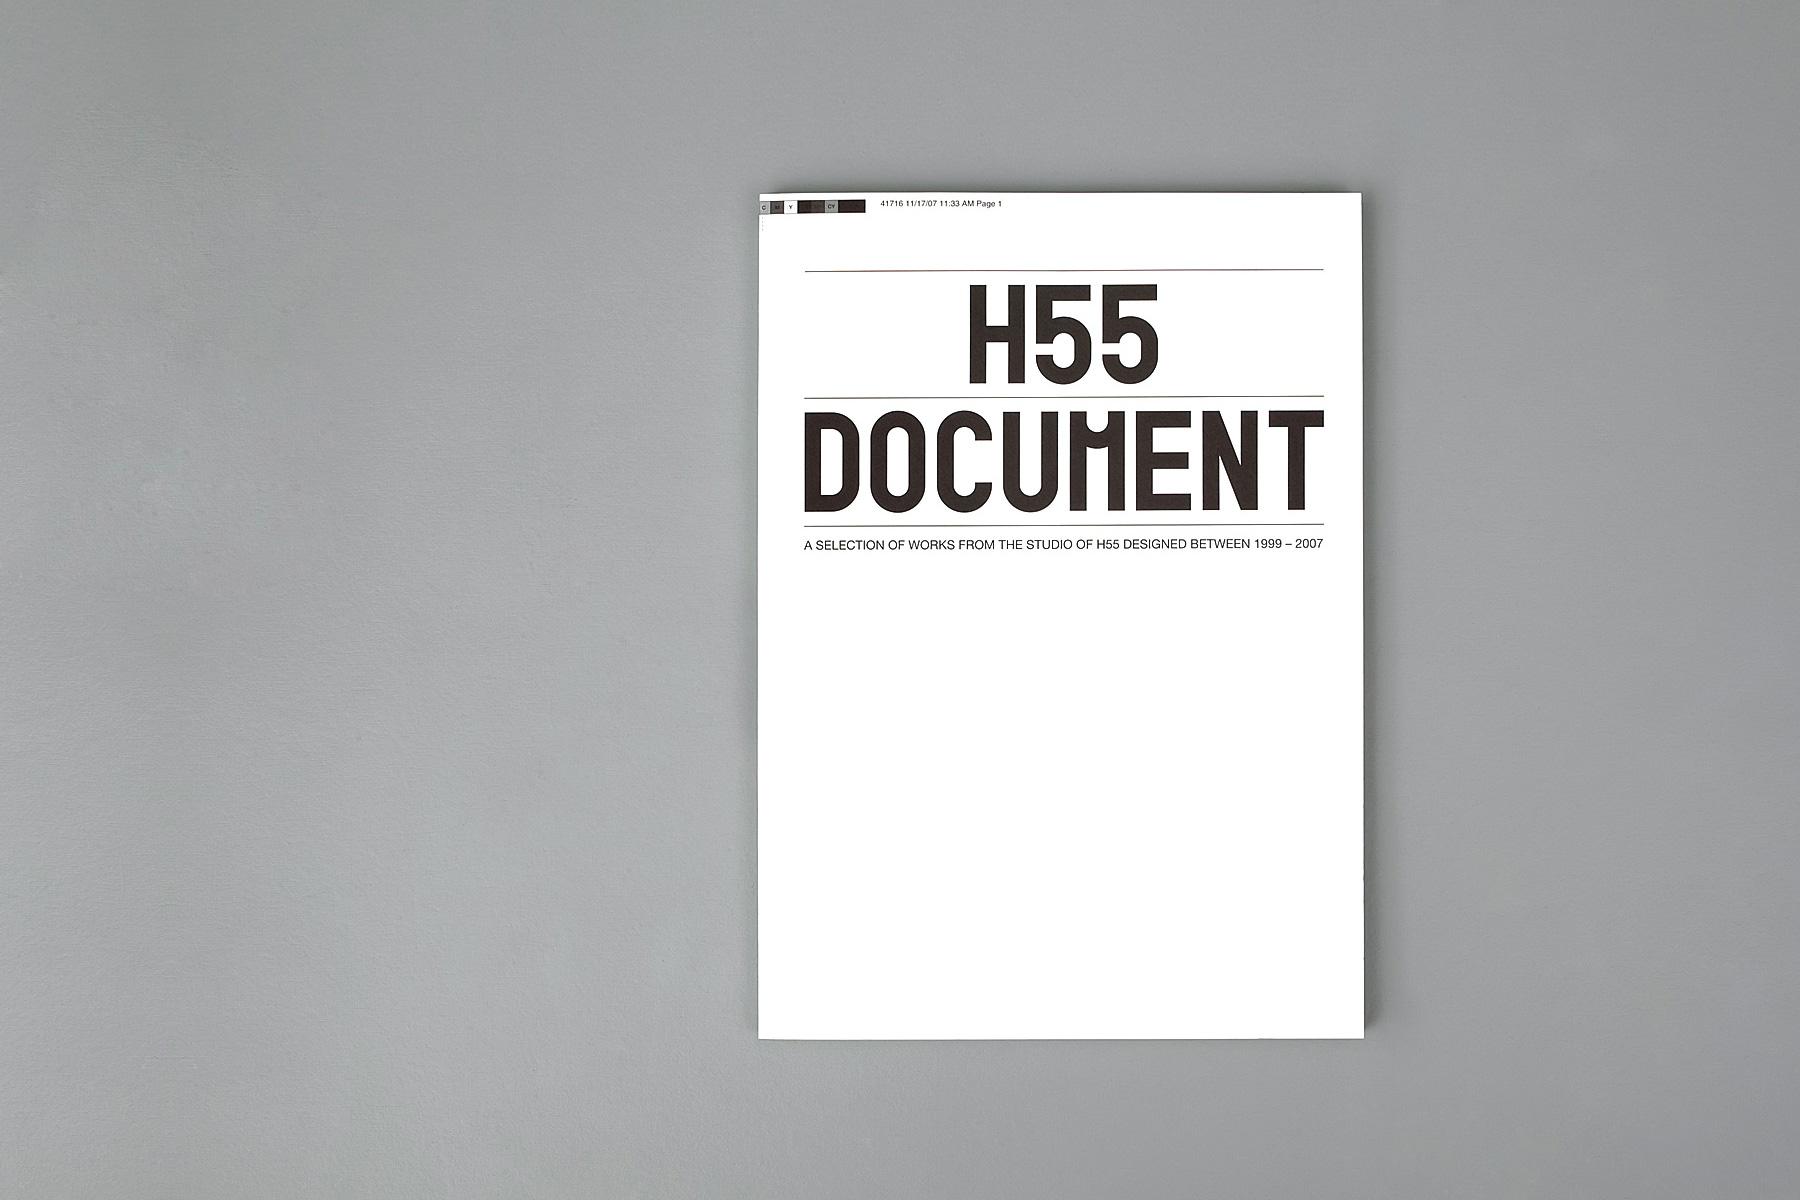 H55-Document-1